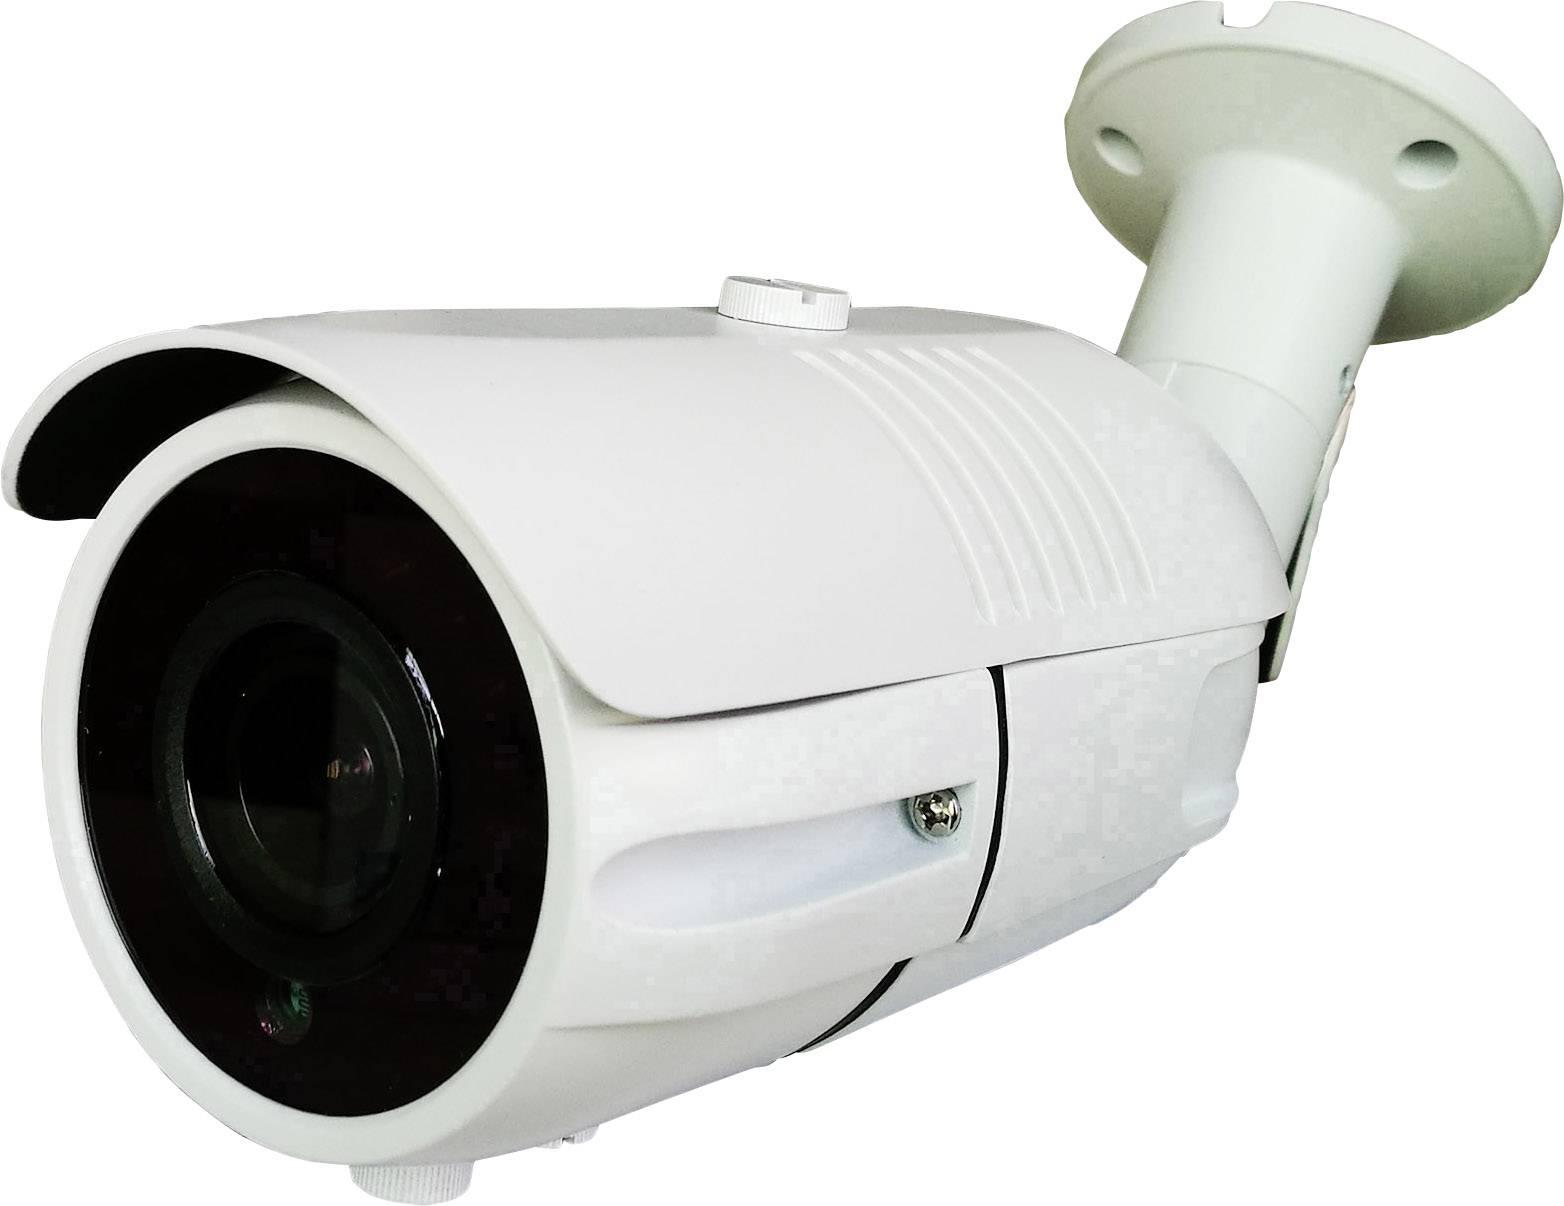 B S Technology Hm Ip5510 Vwx40 Lan Ip CCTV Camera 2560 X